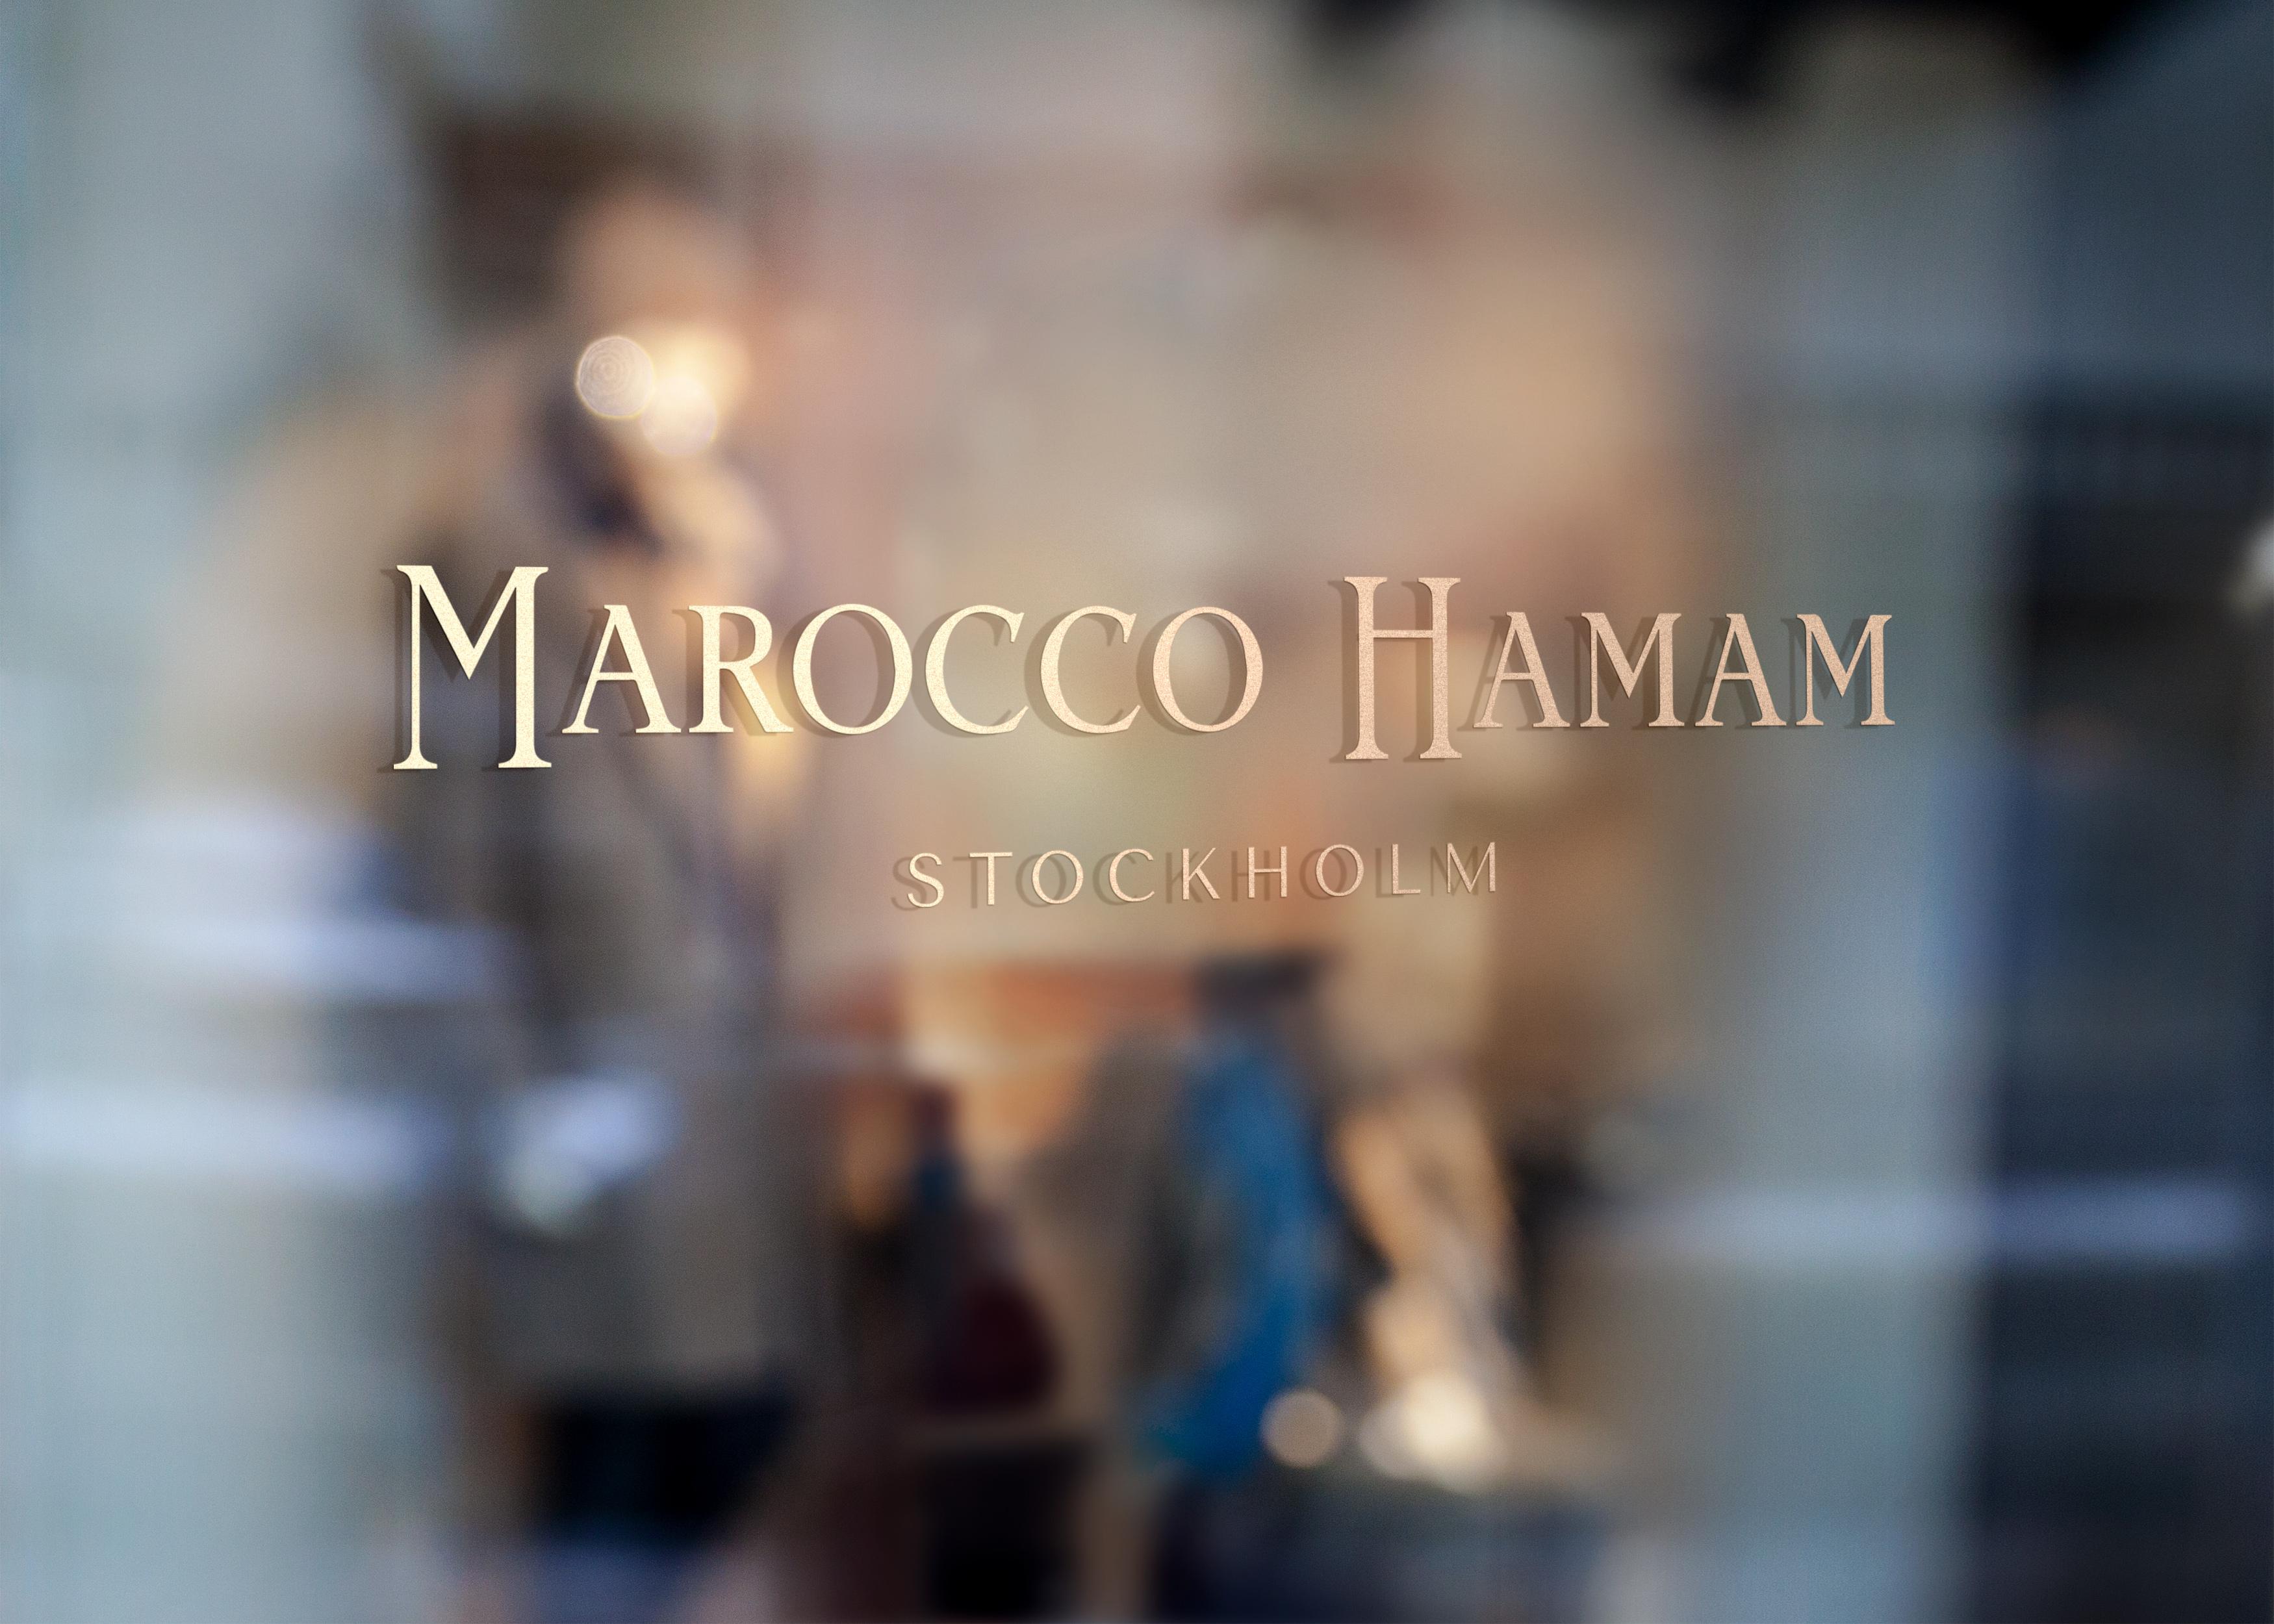 Marocco Hamam